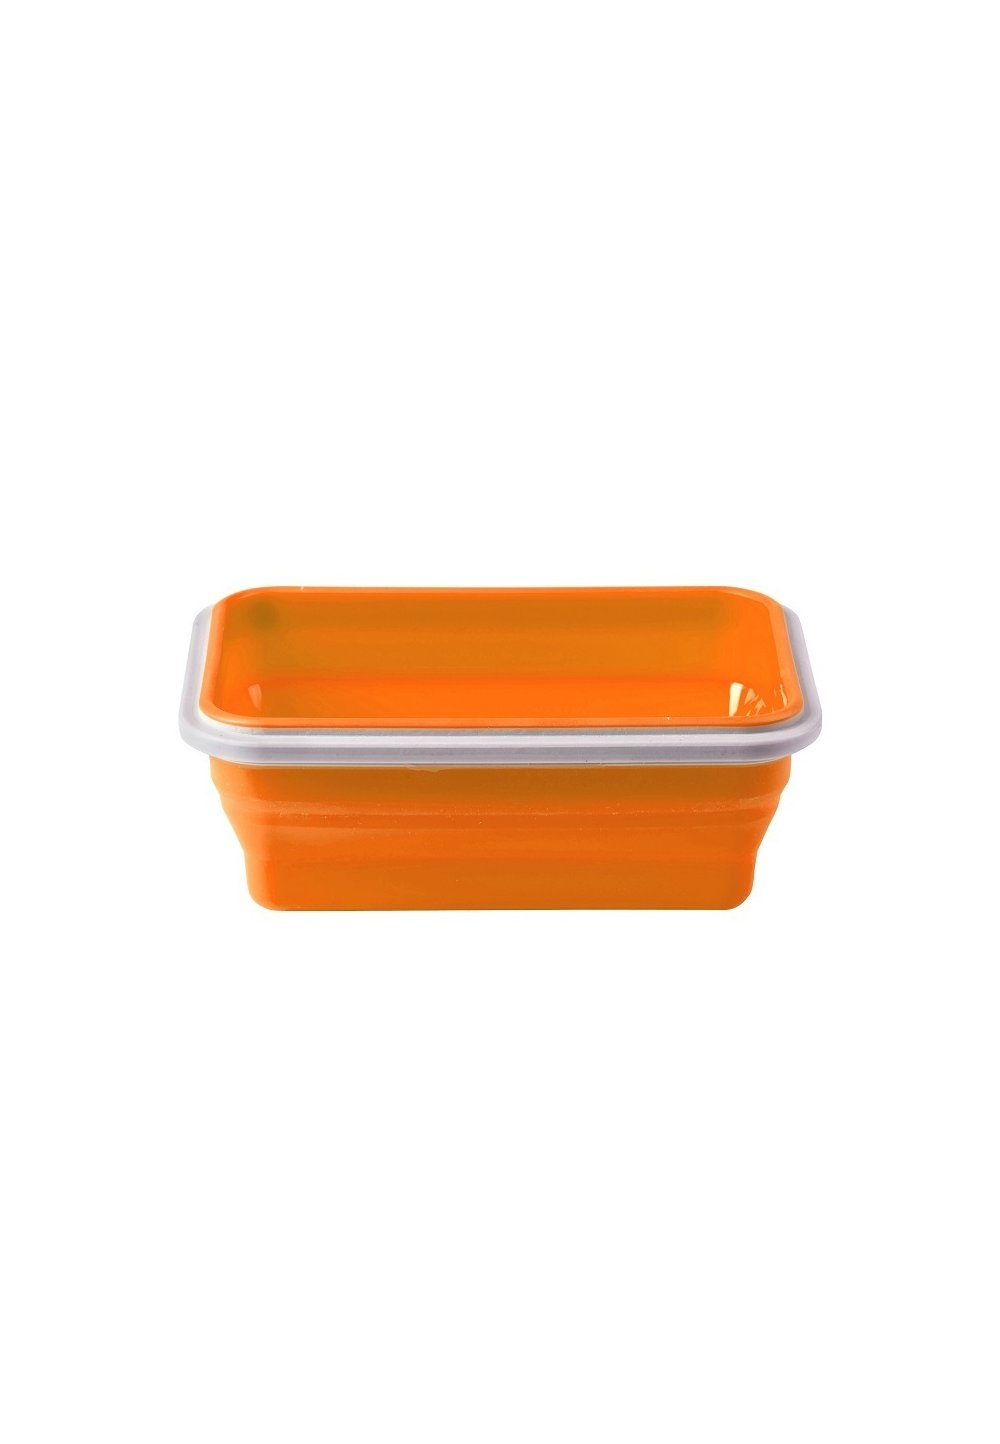 Cutie silicon, 500ml, portocalie imagine